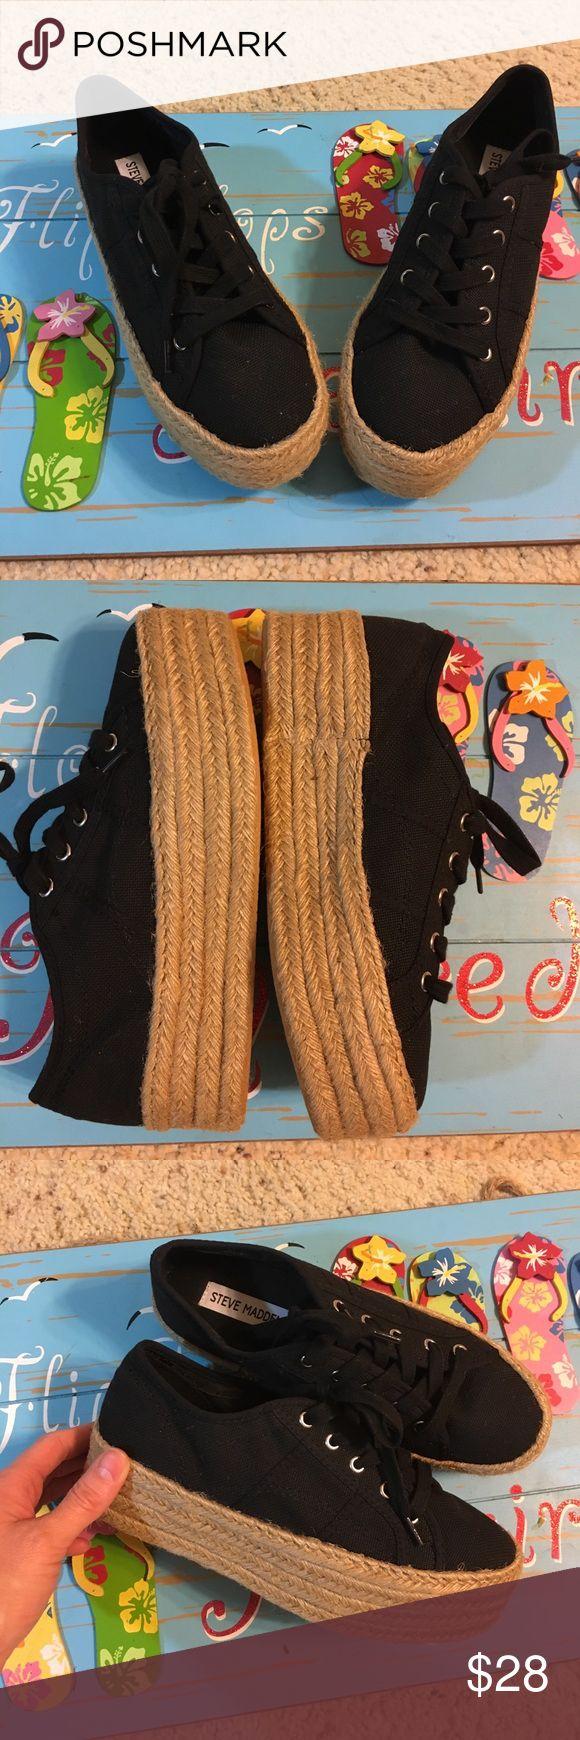 NWOT Steve Madden platform shoes Super cute Black and Tan rope platform shoes by Steve Madison never worn perfect for anytime size 6.5 Steve Madden Shoes Wedges